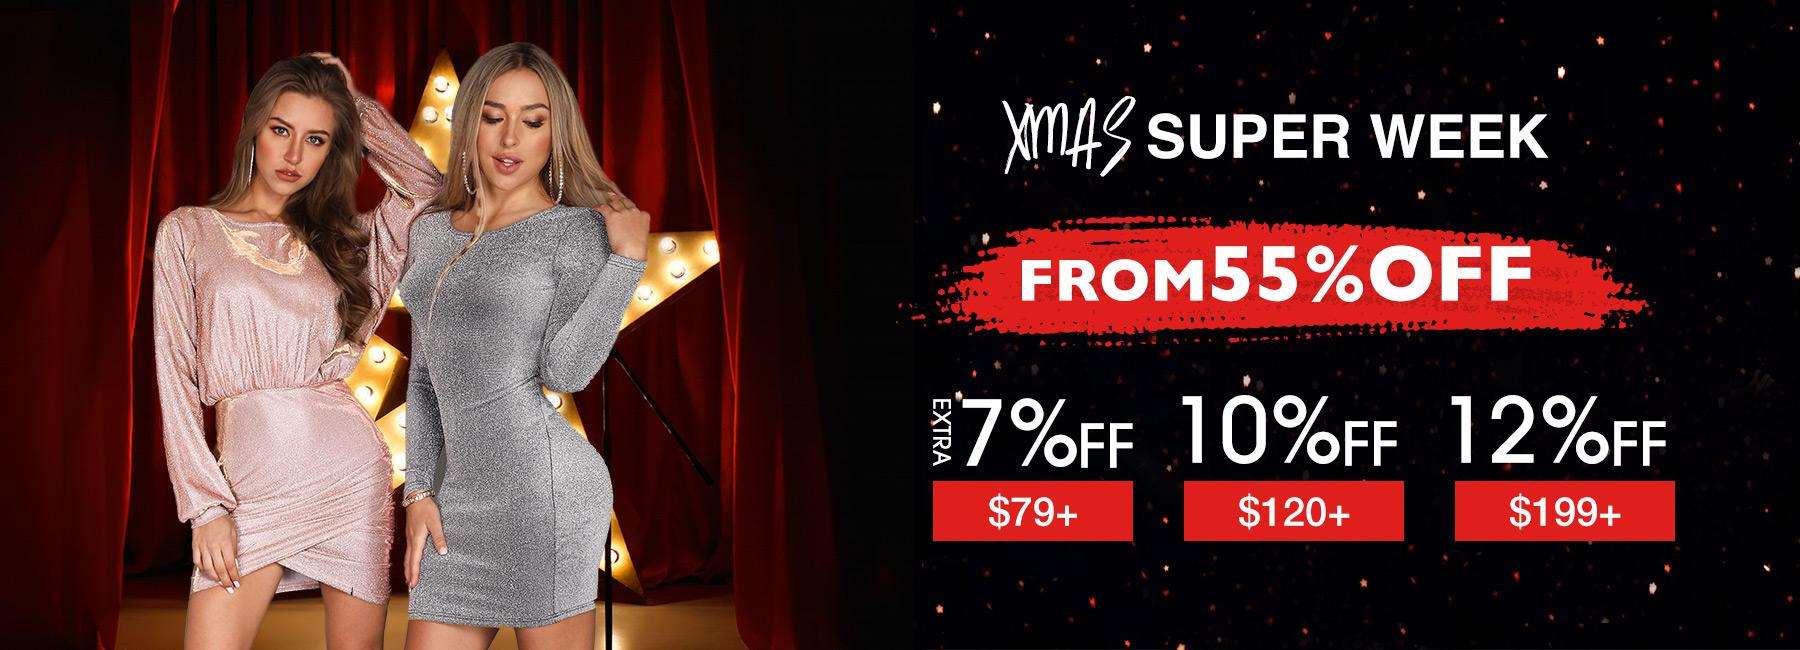 Xmax Super Week